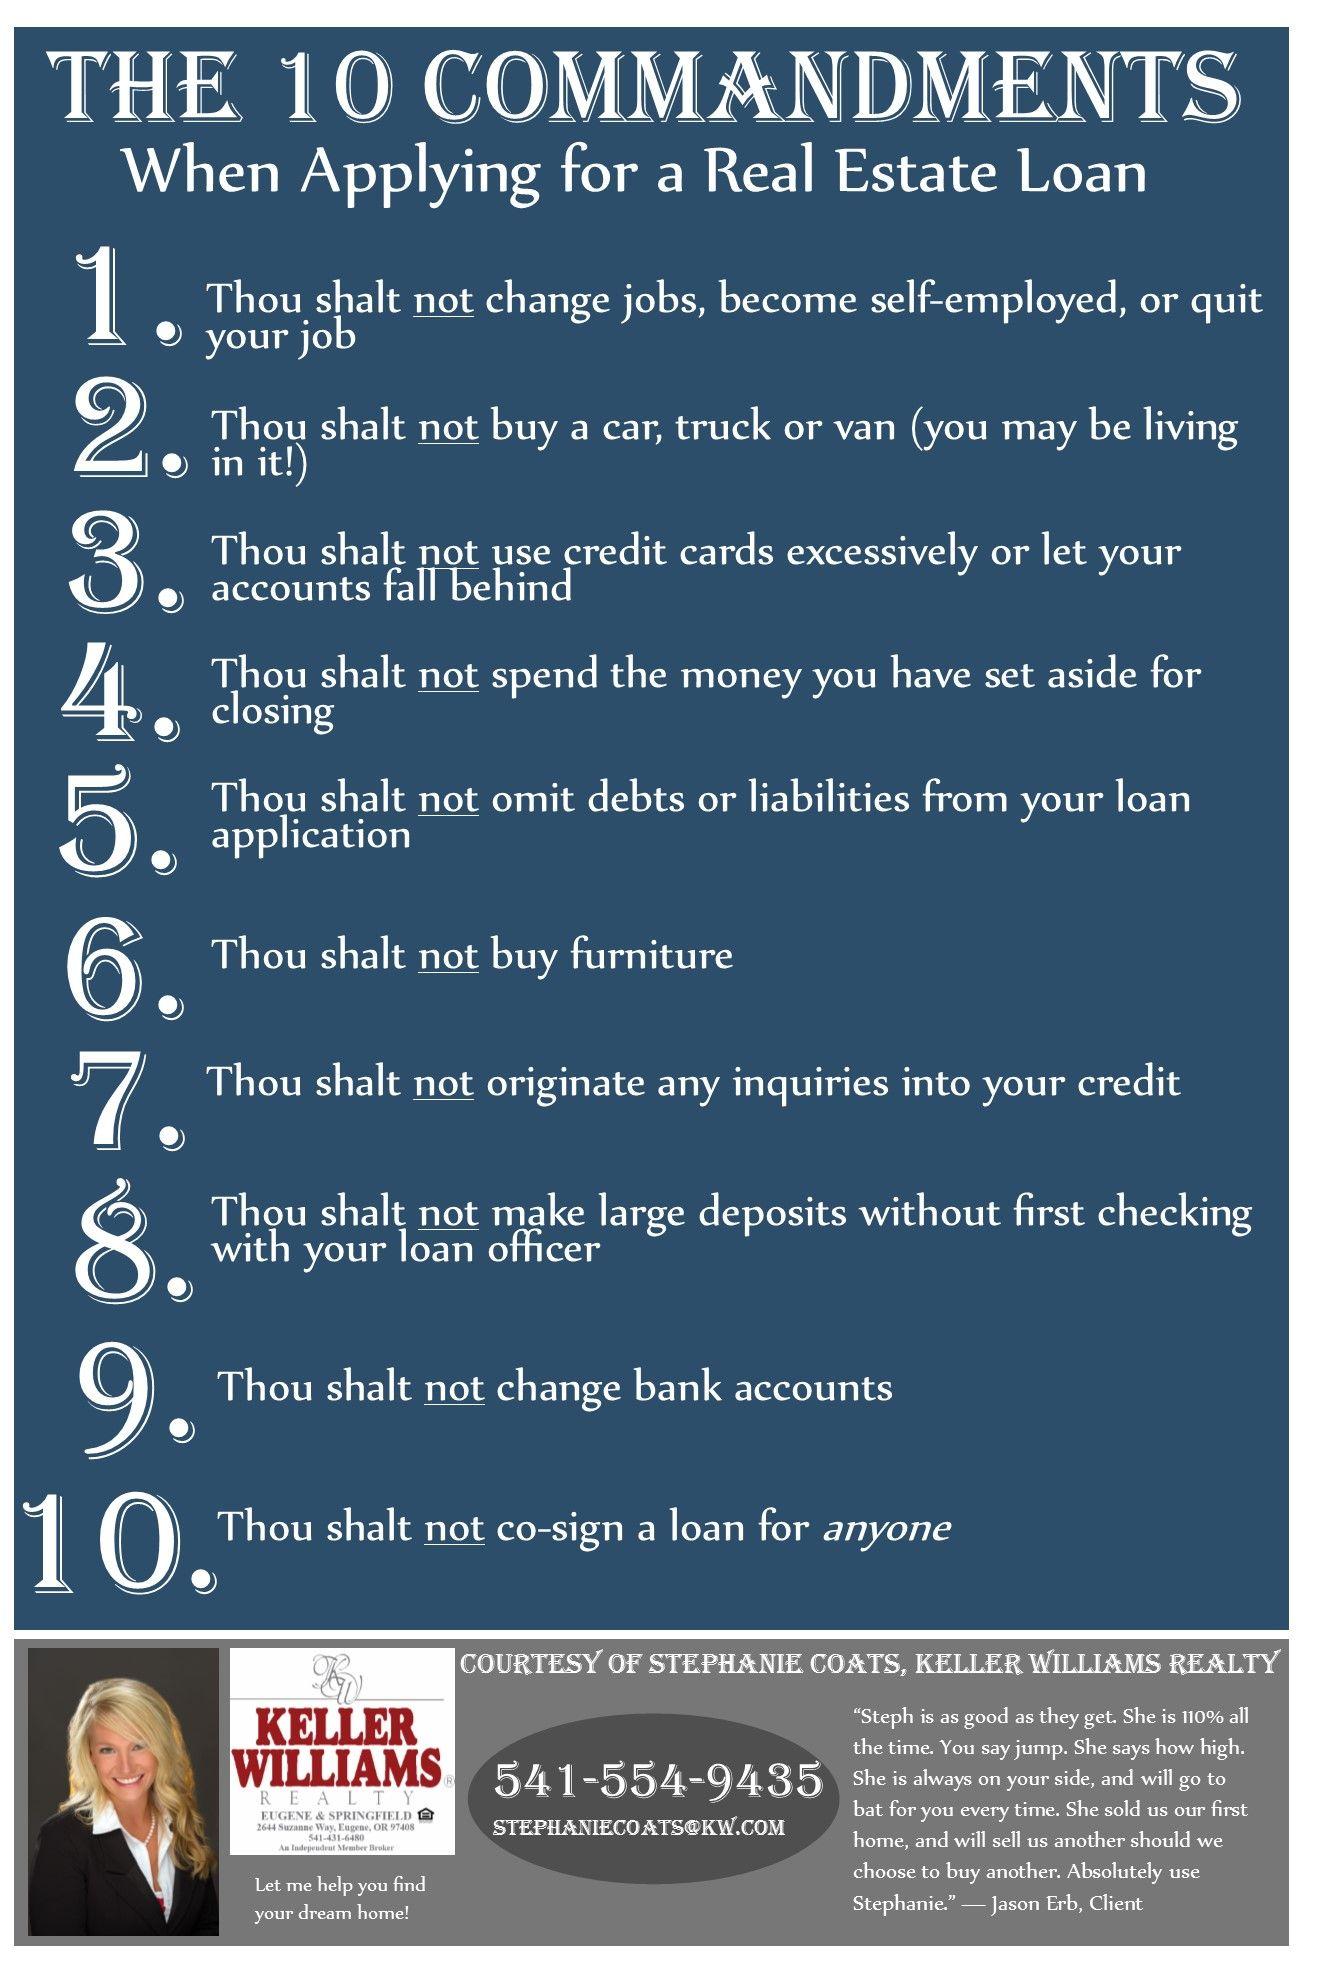 The Home Buying Process | Home buying process, Home buying ...